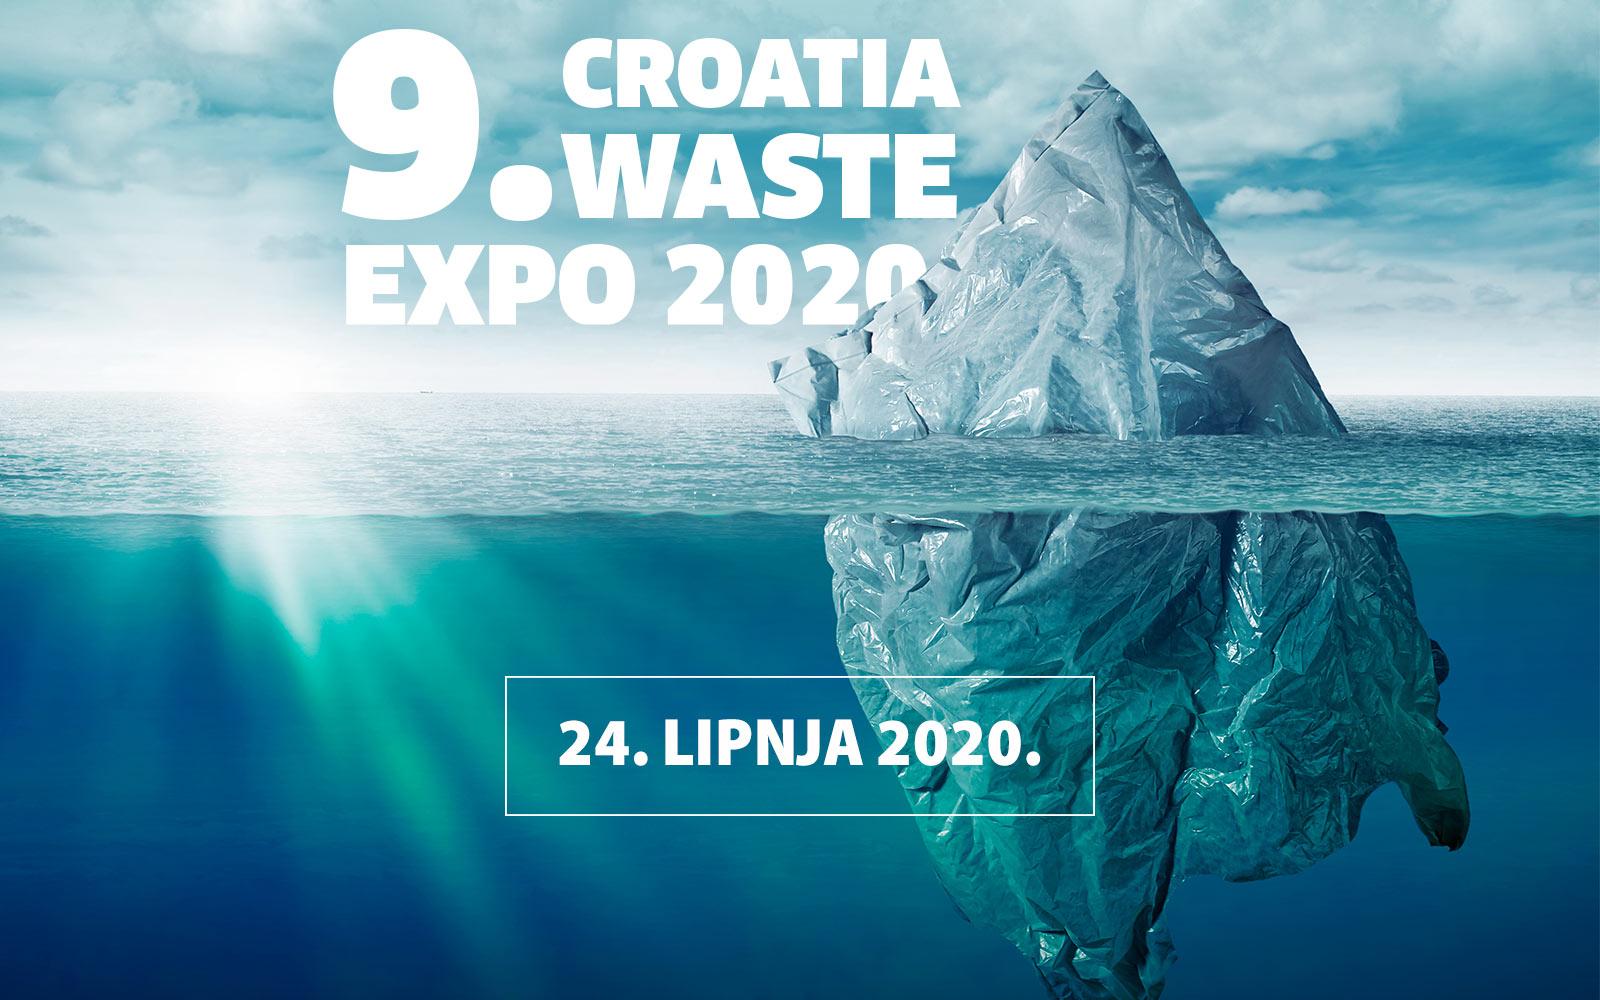 Croatia Waste Expo 2020